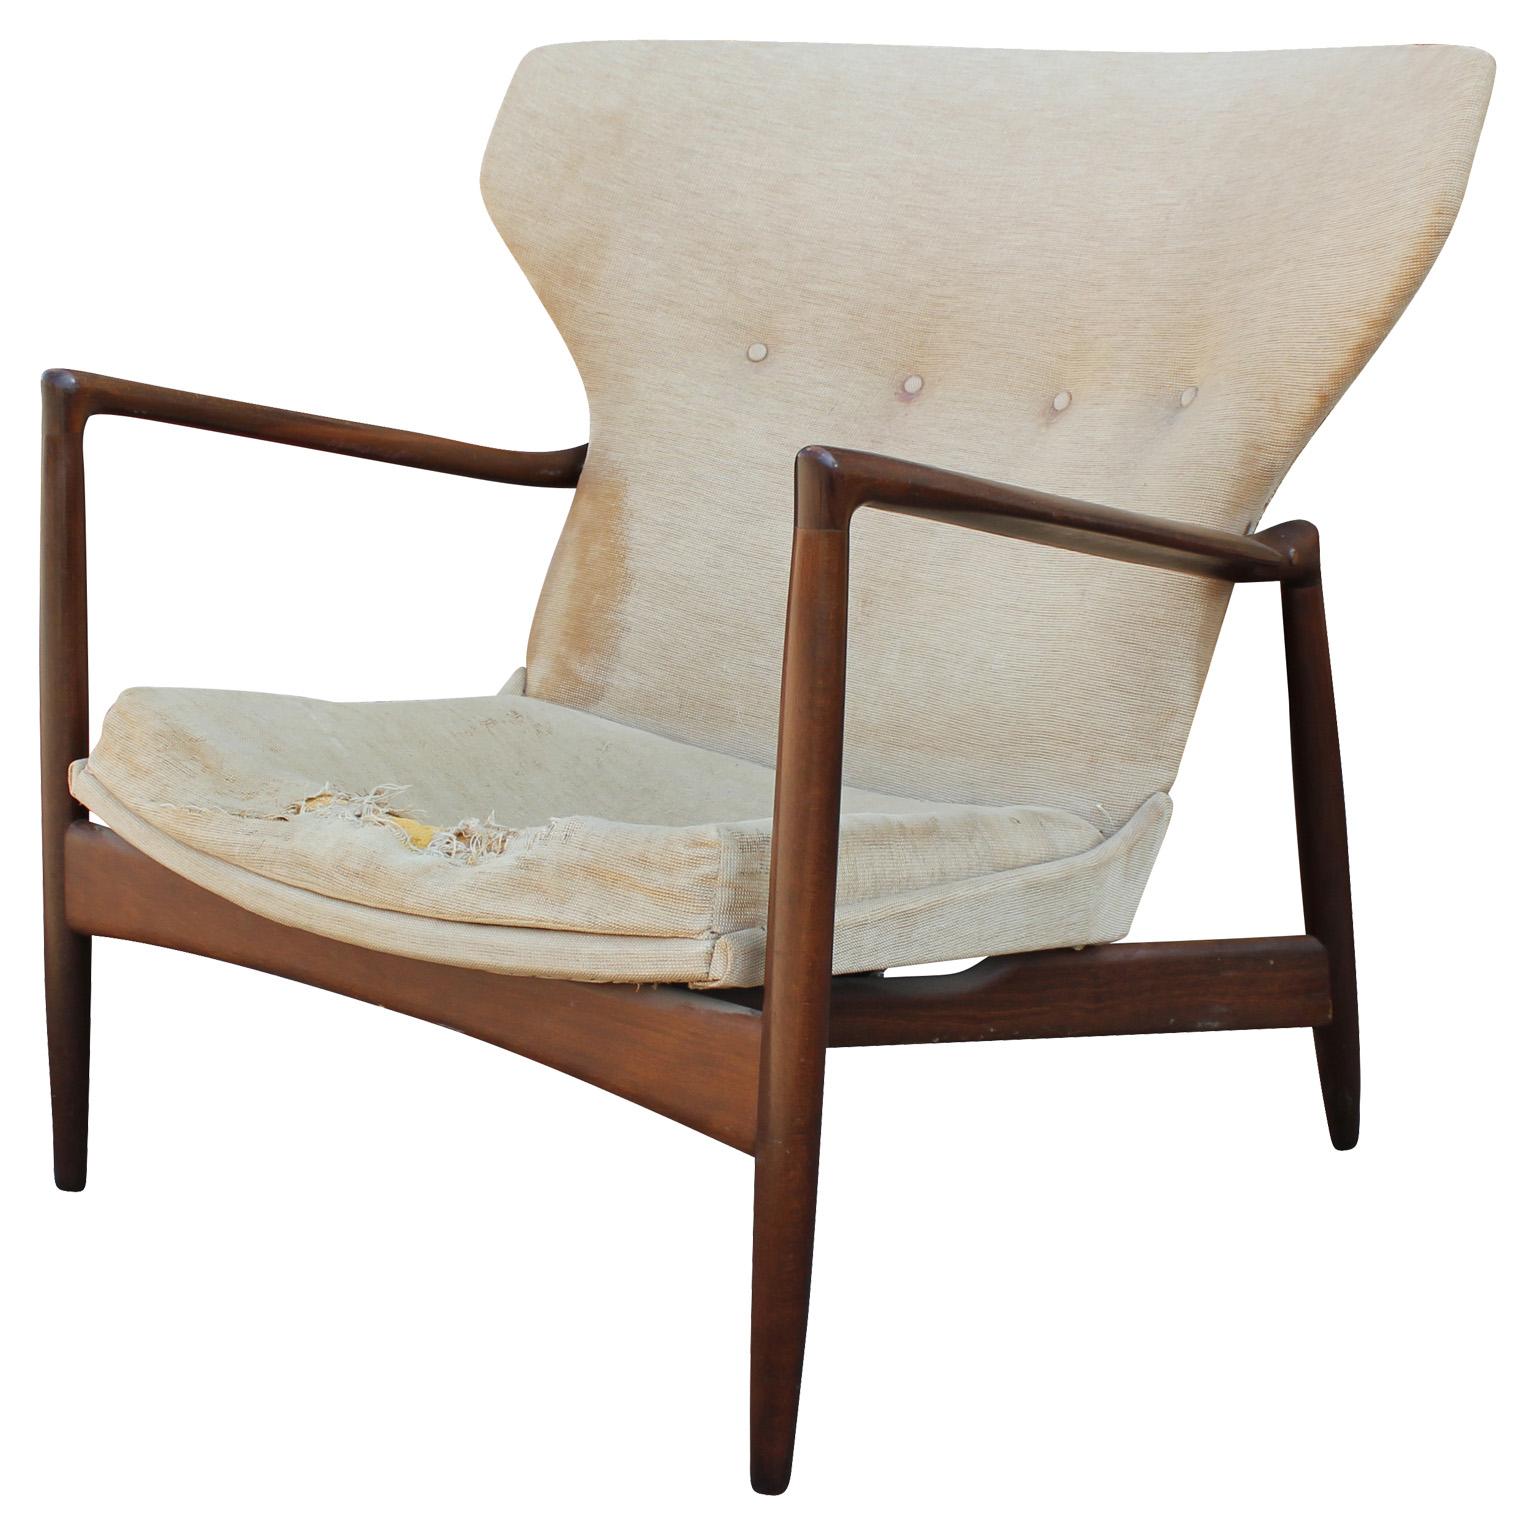 Rare Sculptural Wingback Lounge Chair by Ib Kofod Larsen : kofod2 from www.reevesantiqueshouston.com size 1536 x 1536 jpeg 370kB